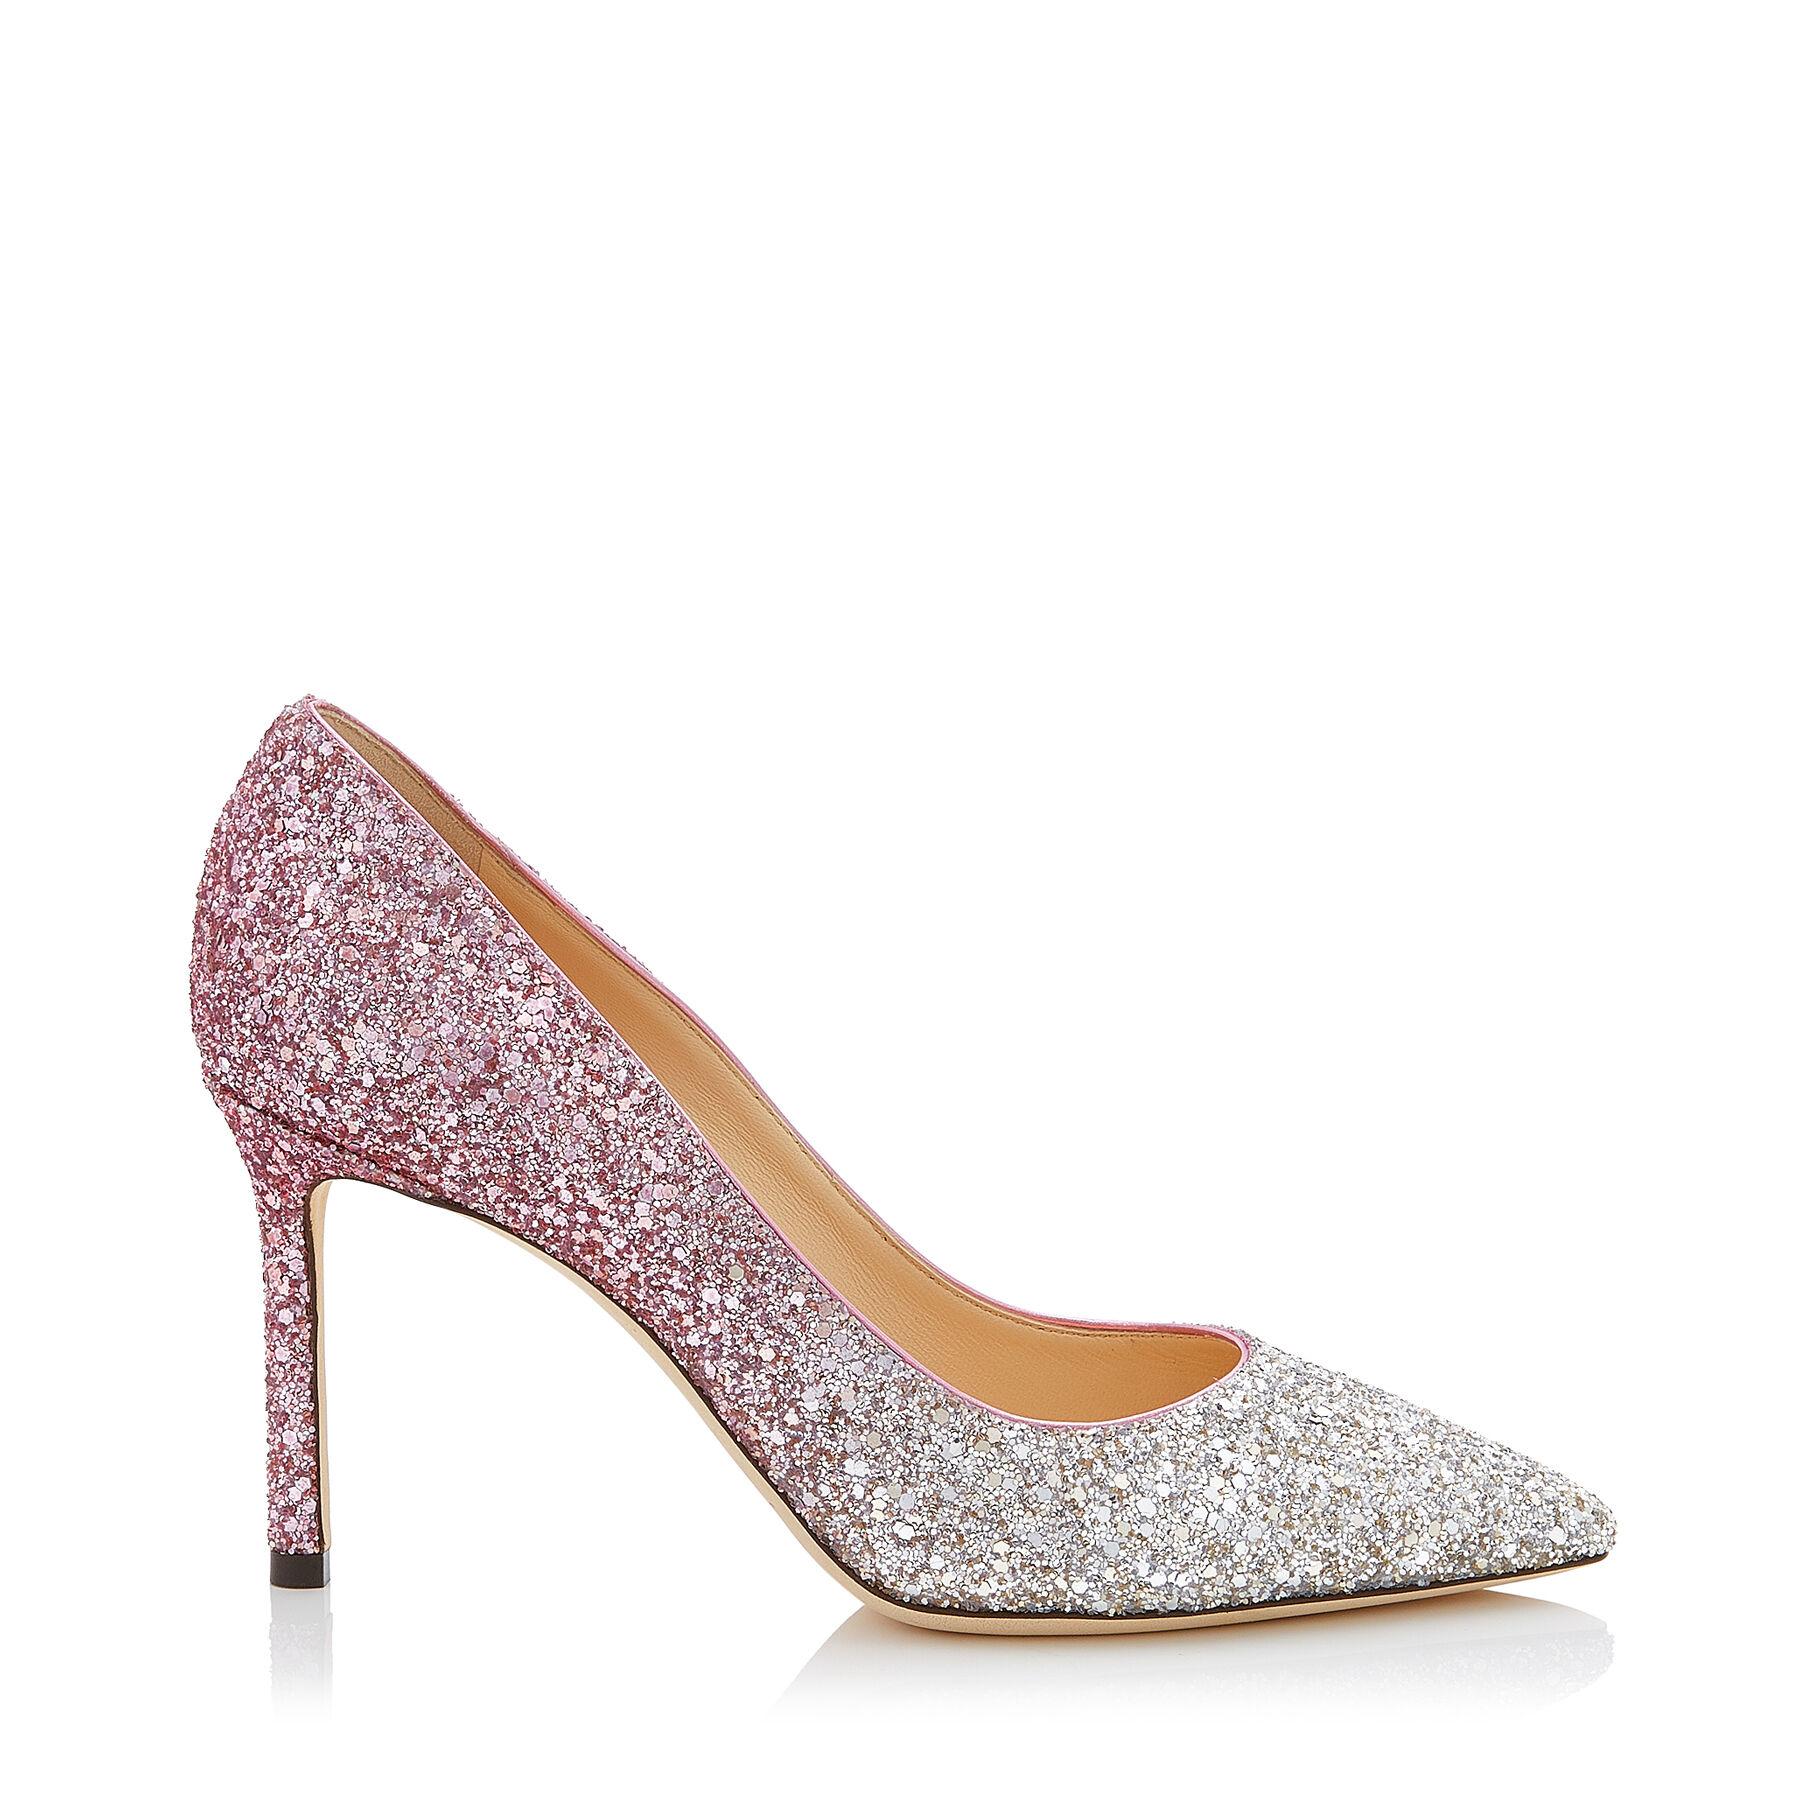 ROMY 85 粉色渐变亮片高跟鞋